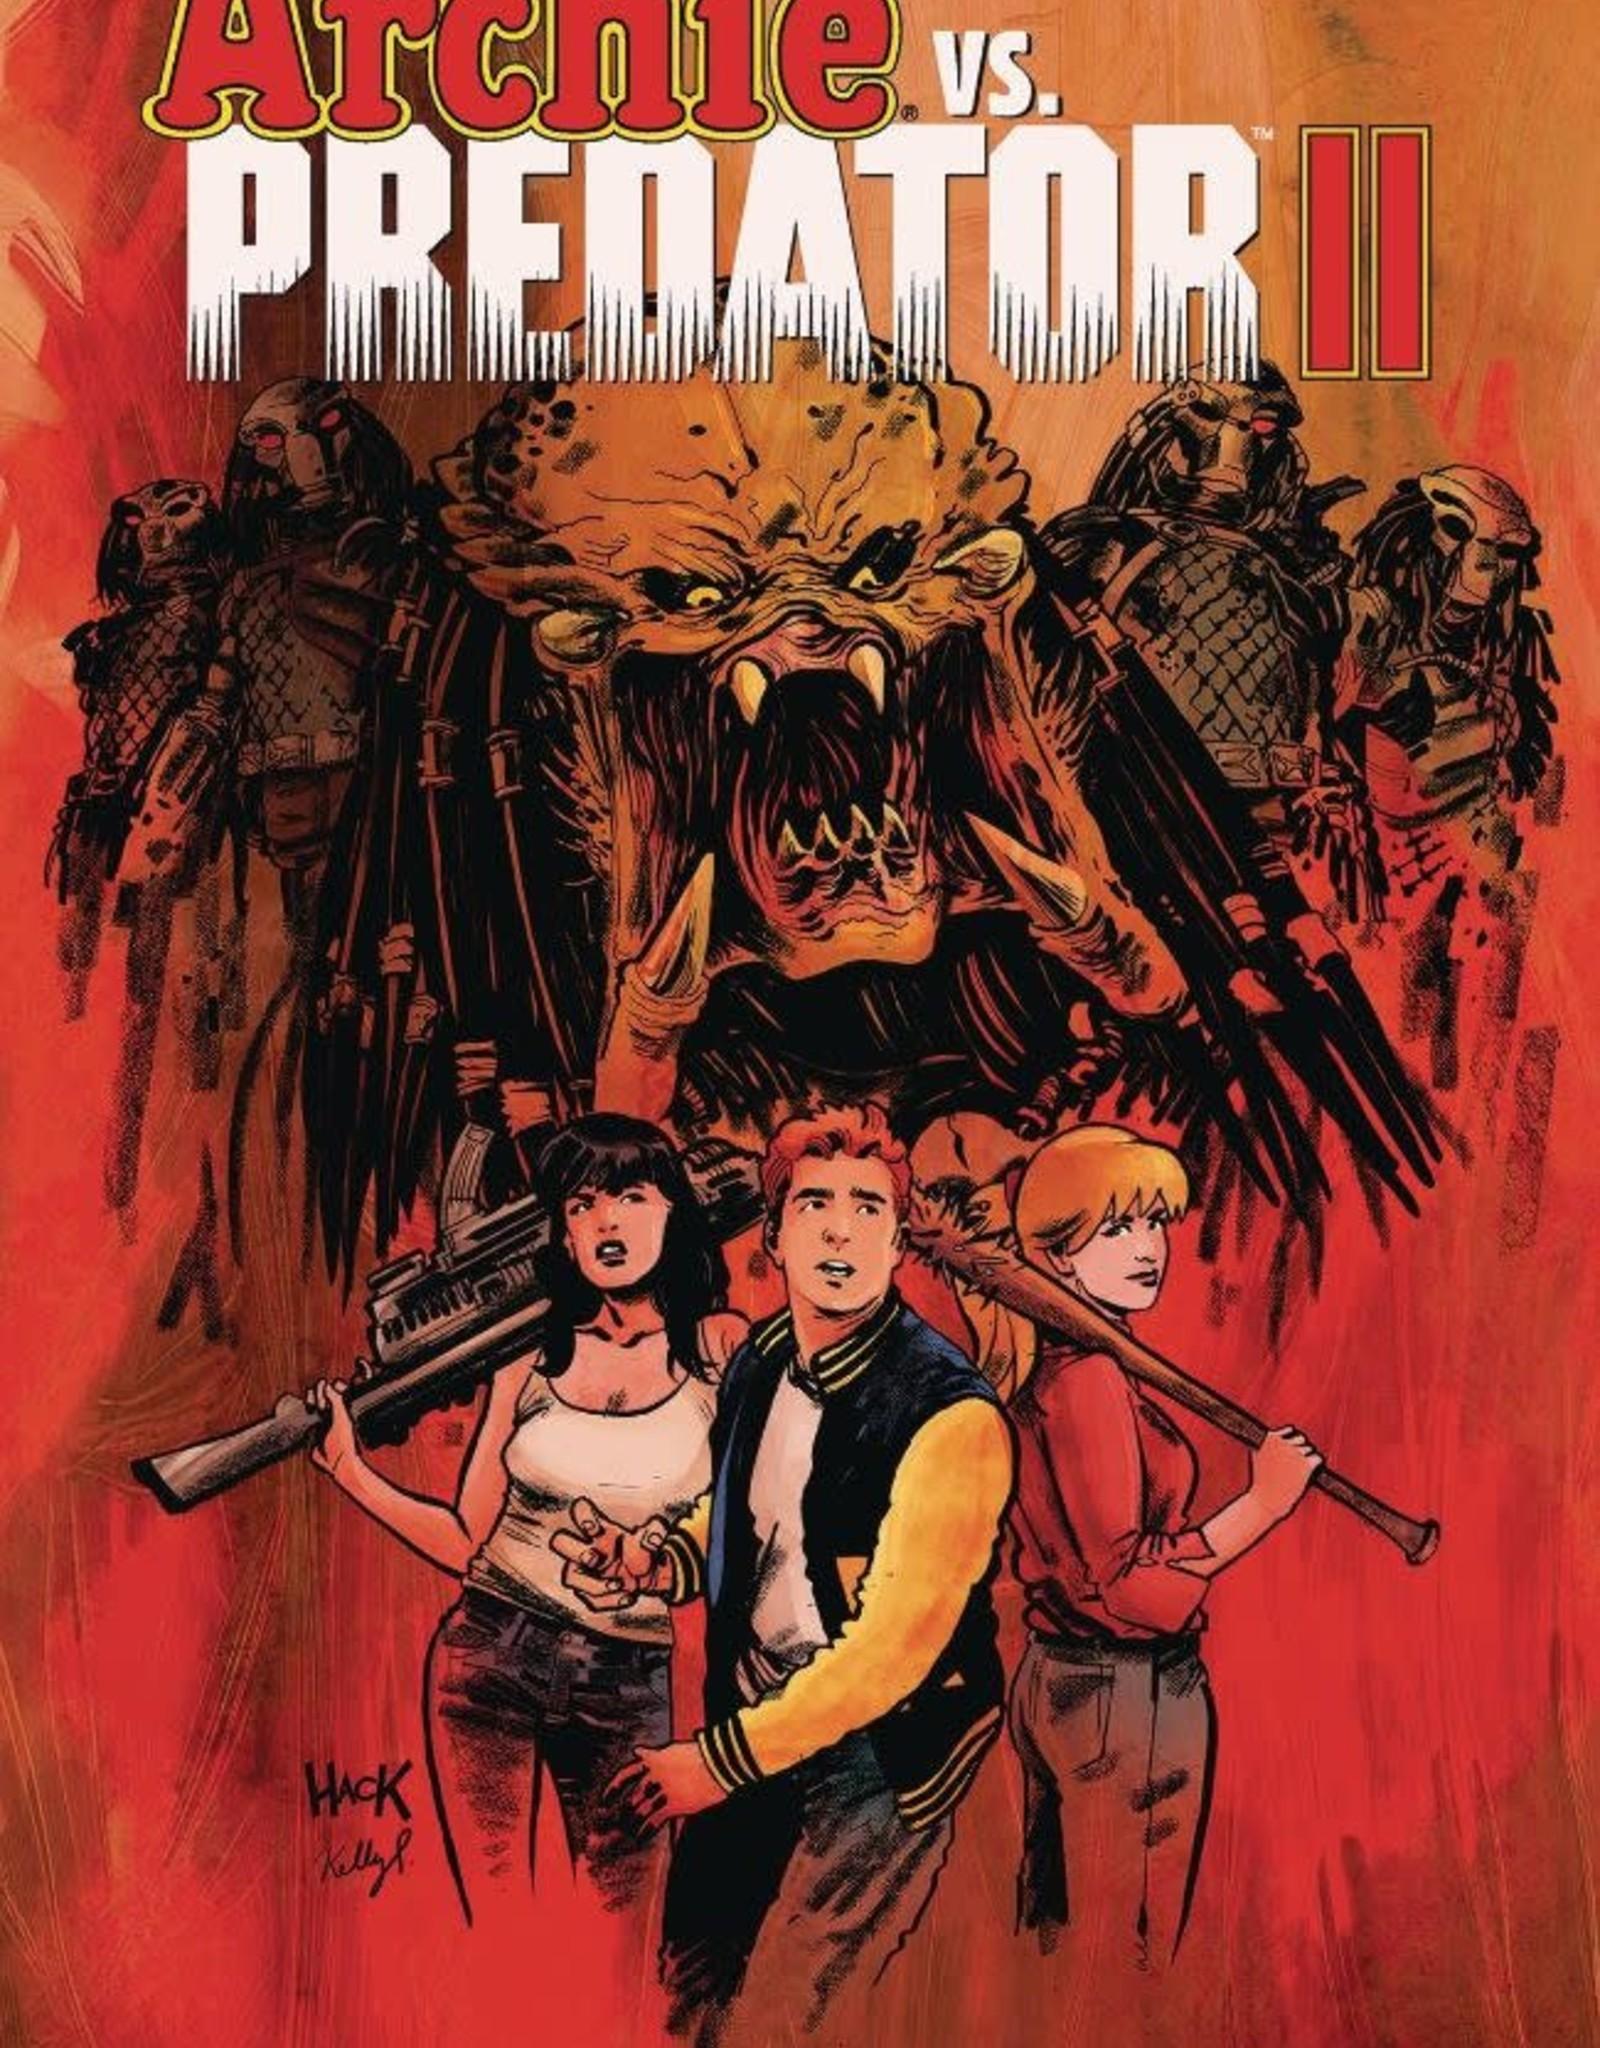 Archie Comics Archie vs. Predator II TP